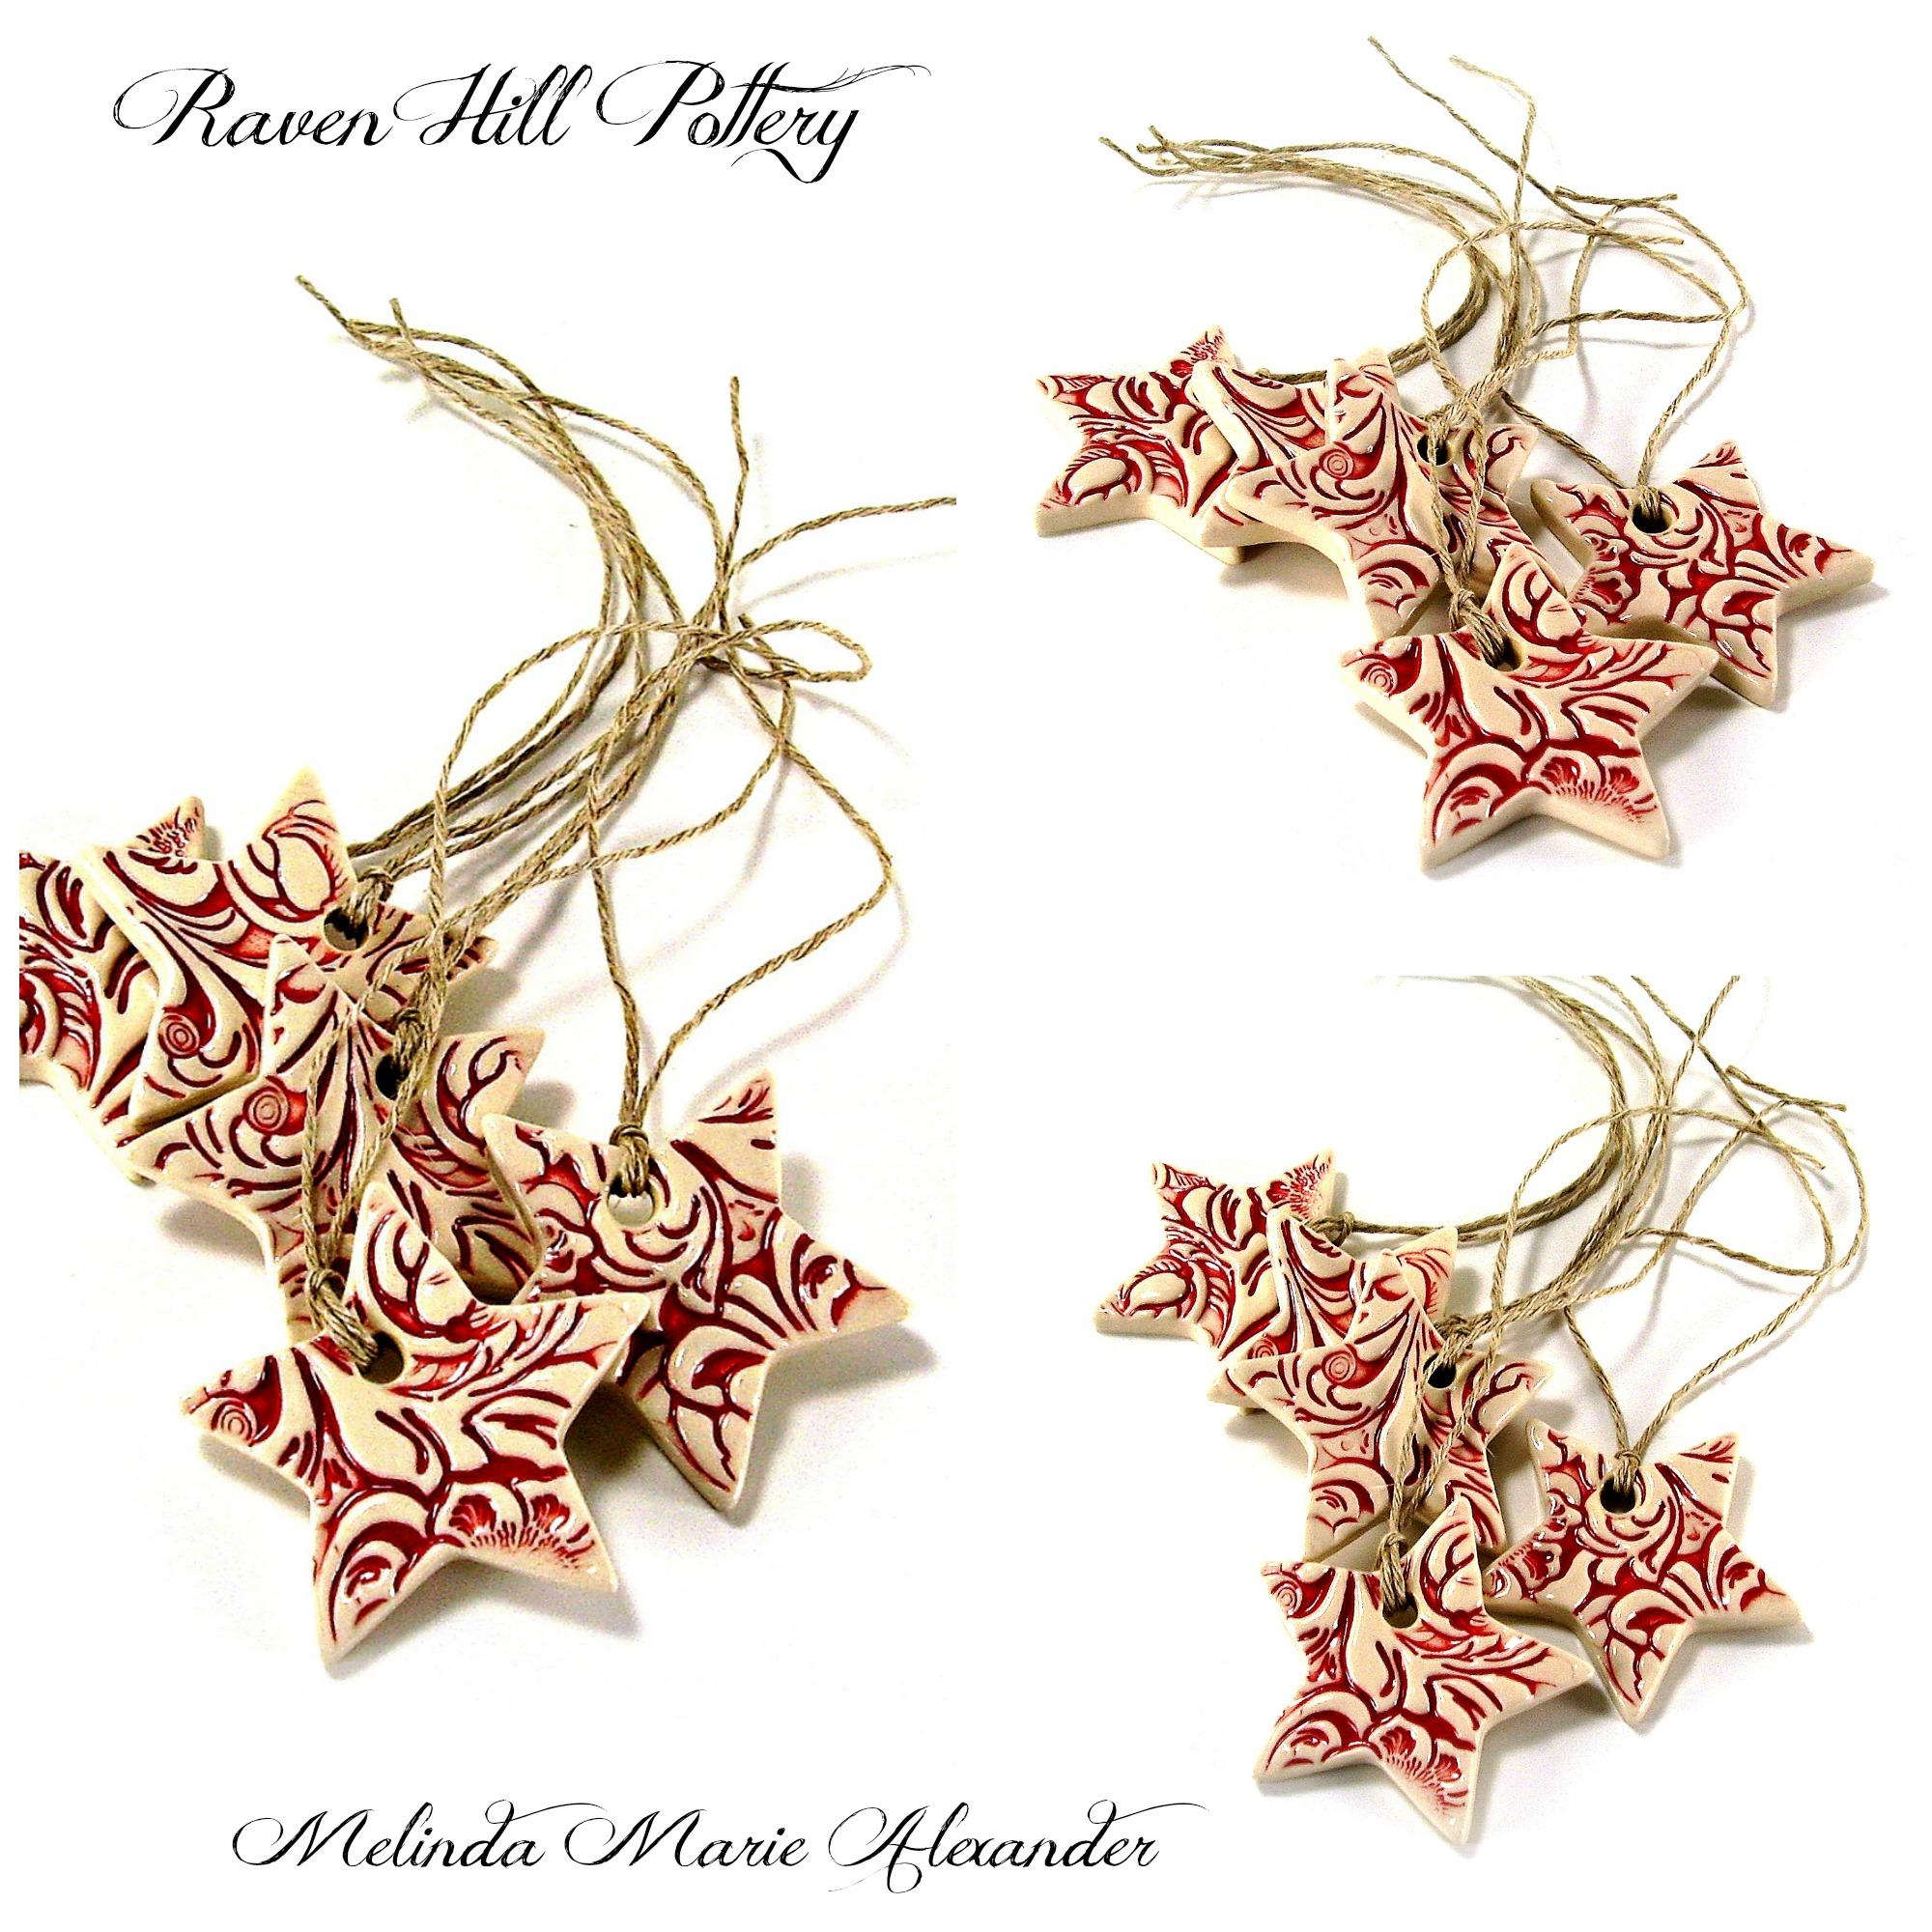 star ornaments red melinda marie alexander ravenhillpottery.etsy.com with textjpg